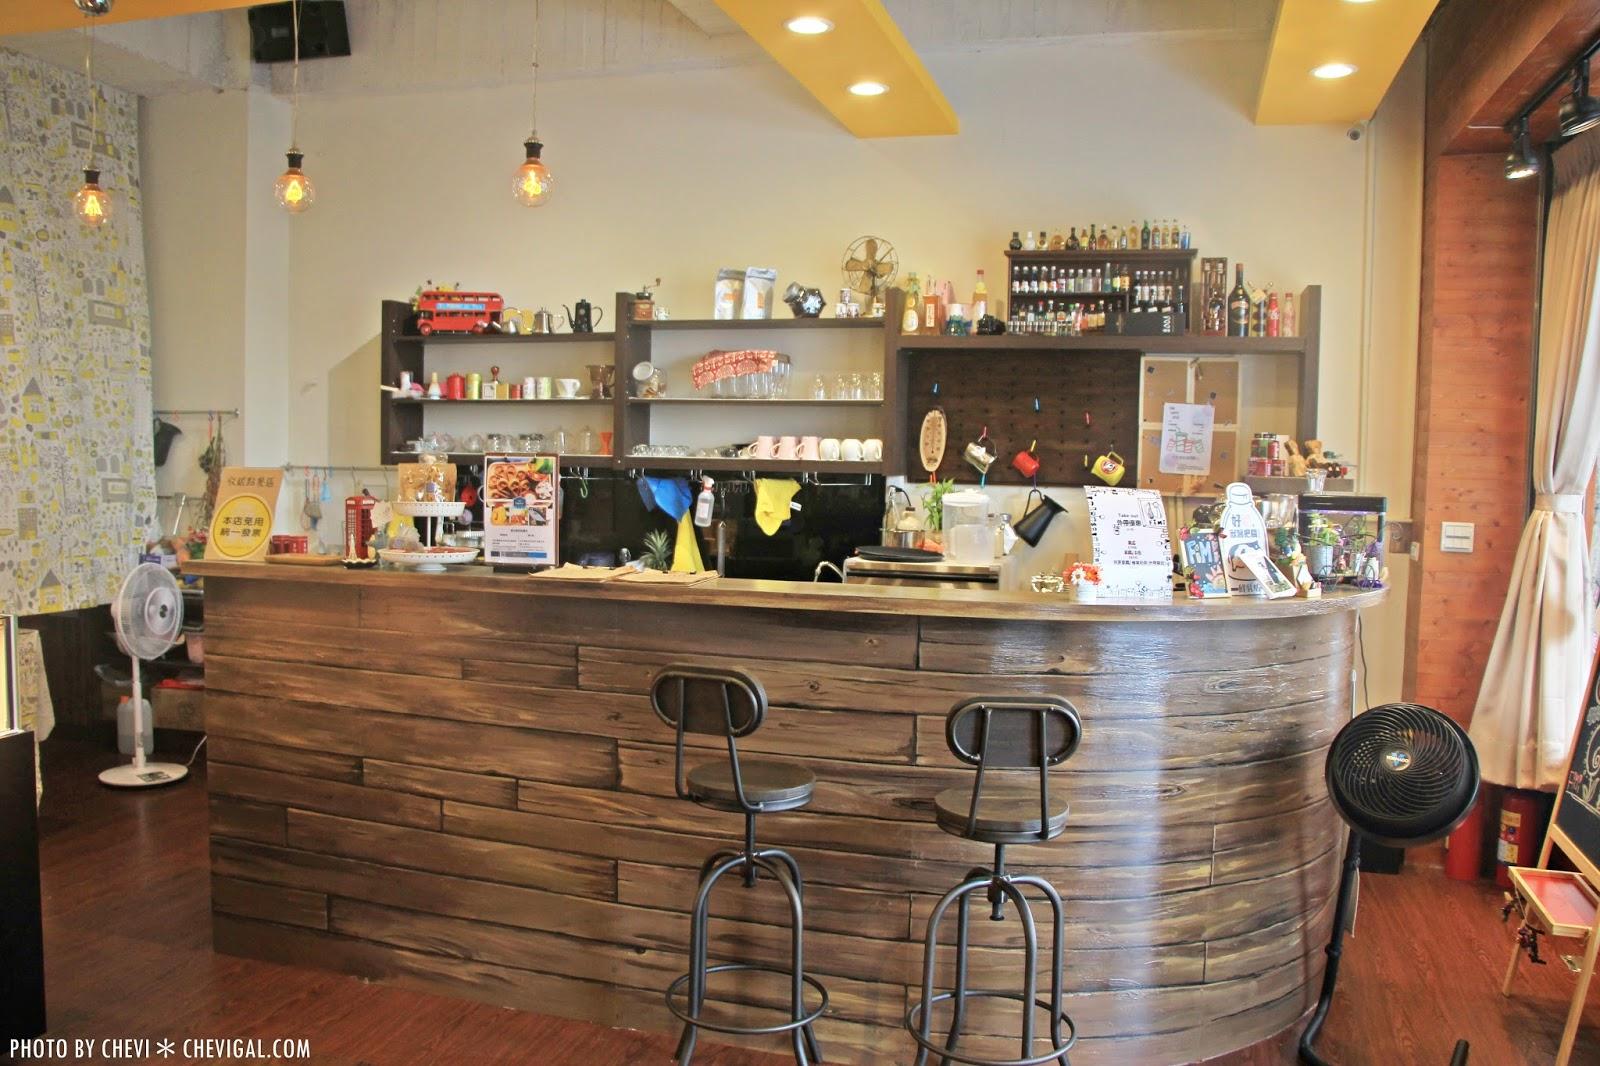 IMG 9339 - 台中烏日│FiMi 小後山廚房。新鮮手作法式甜點。森林清新風格好放鬆